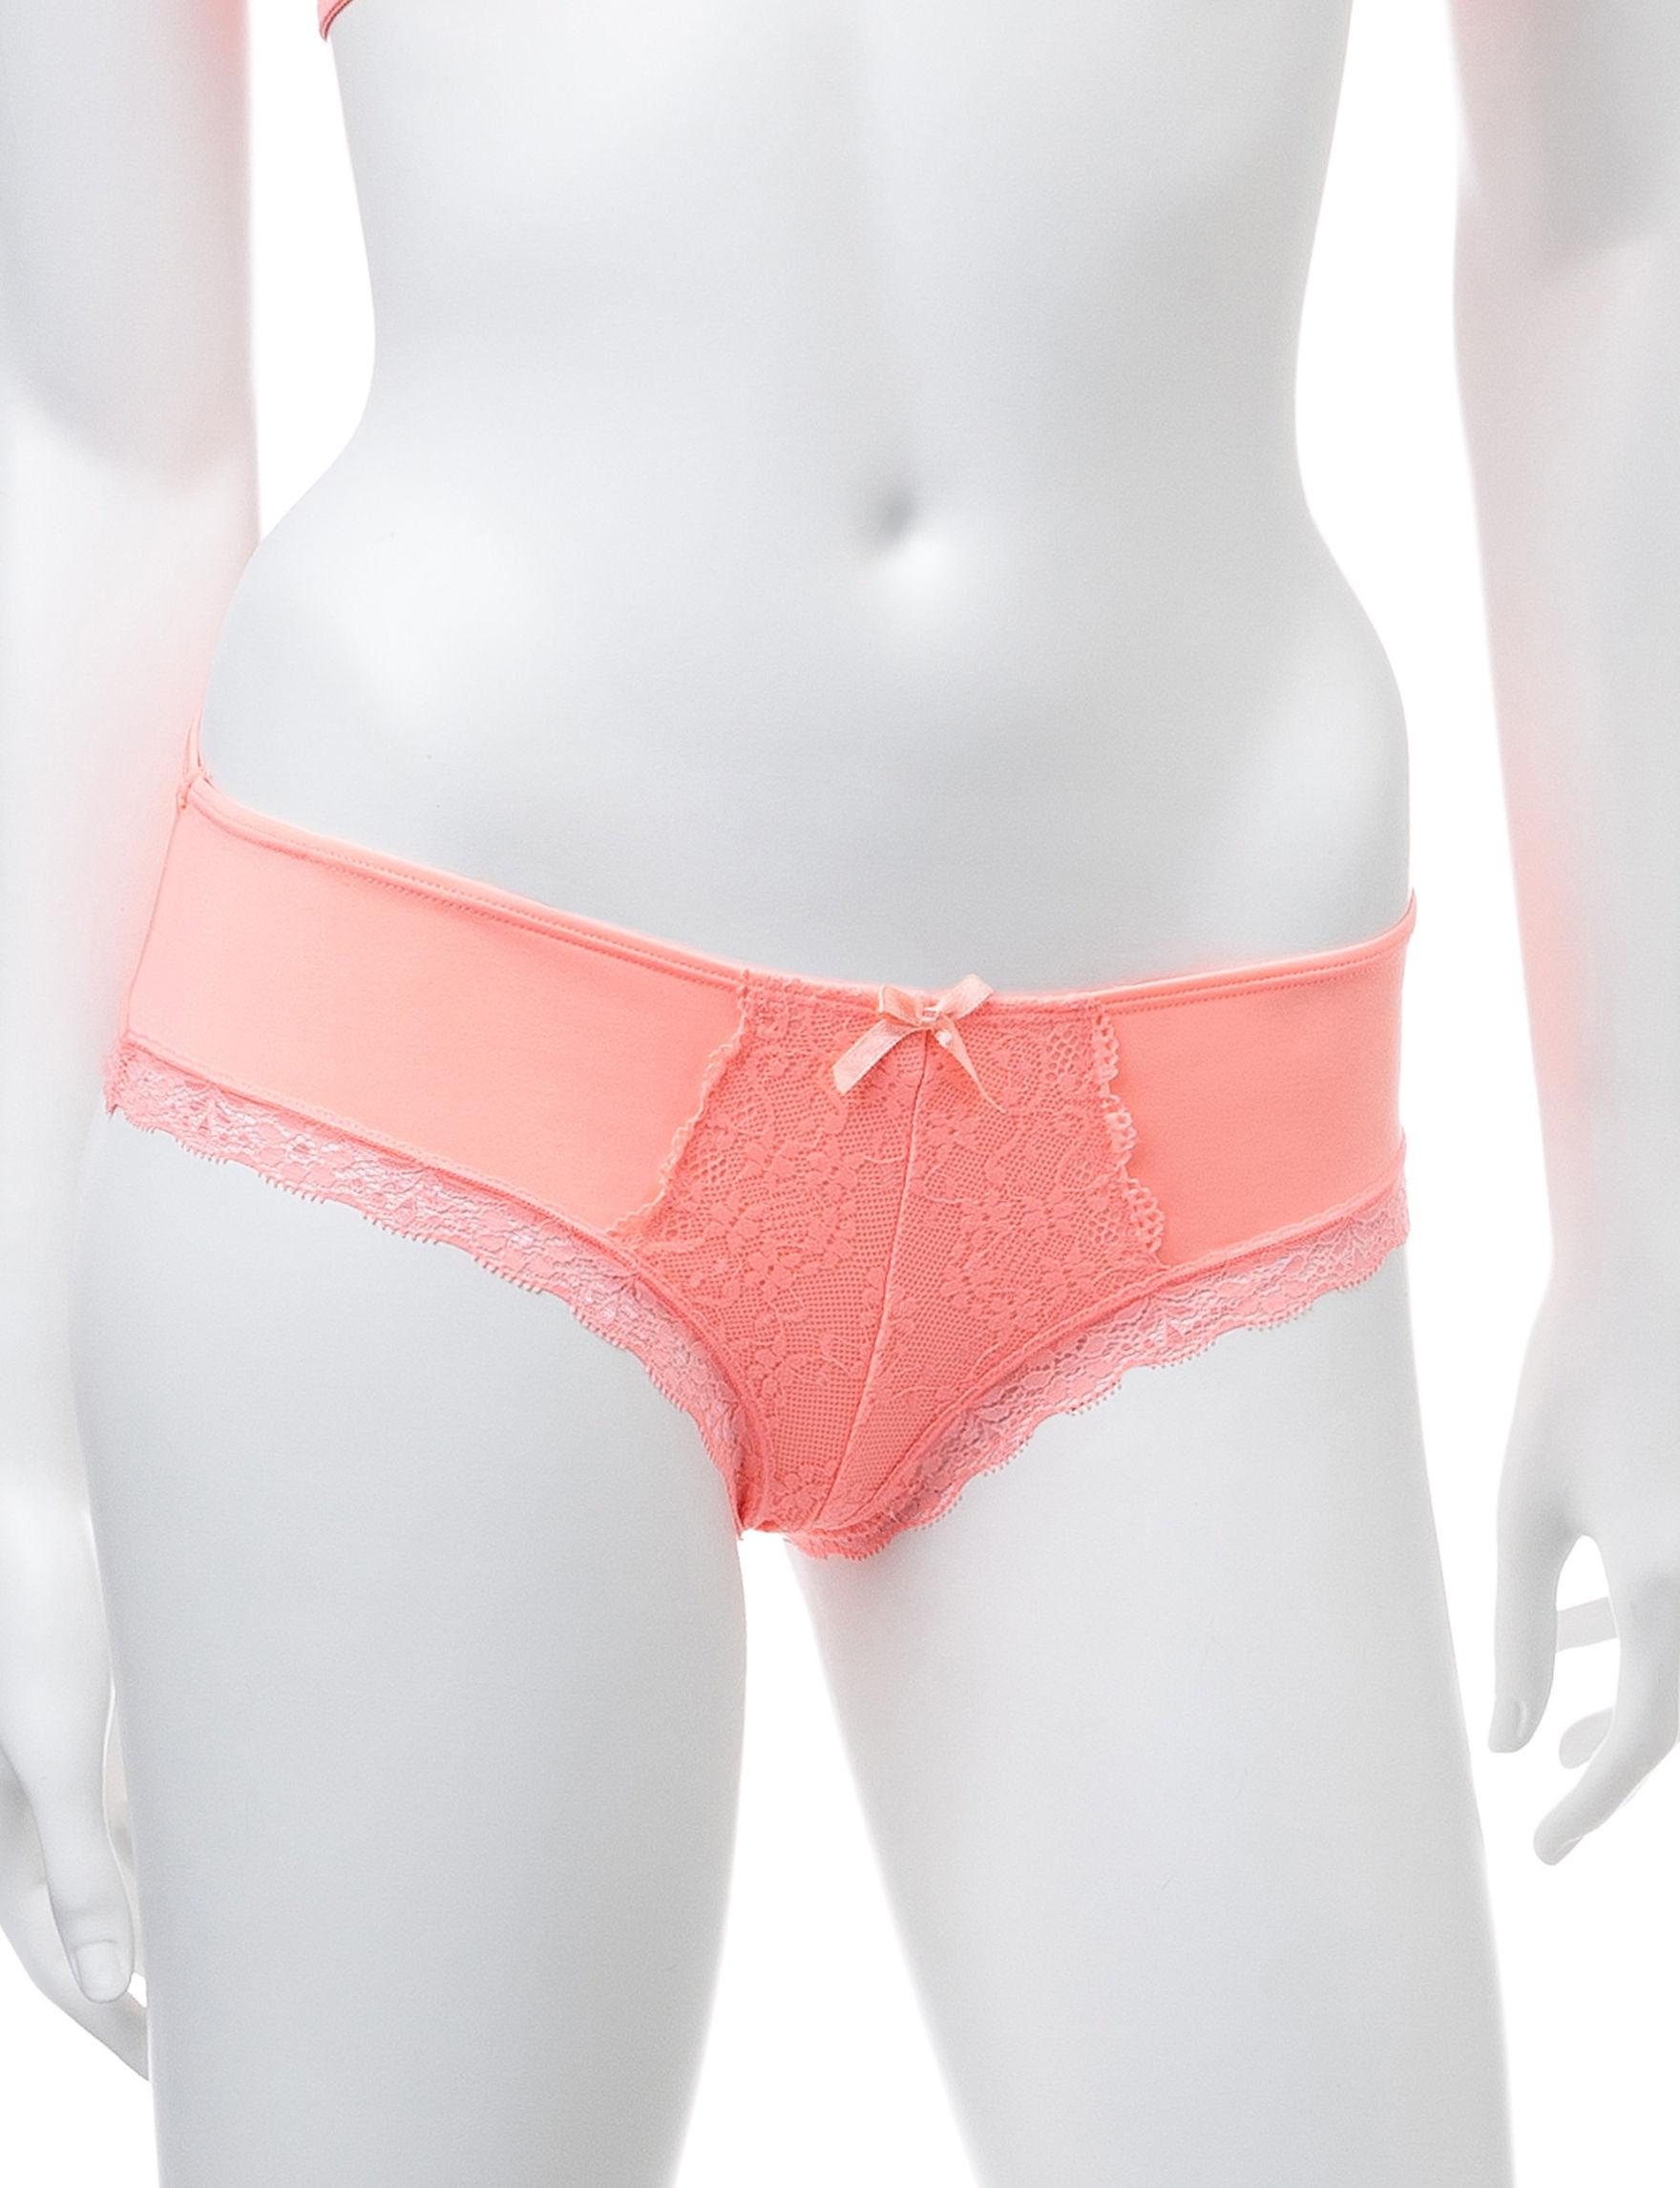 XOXO Pink / Black Bras Bikini